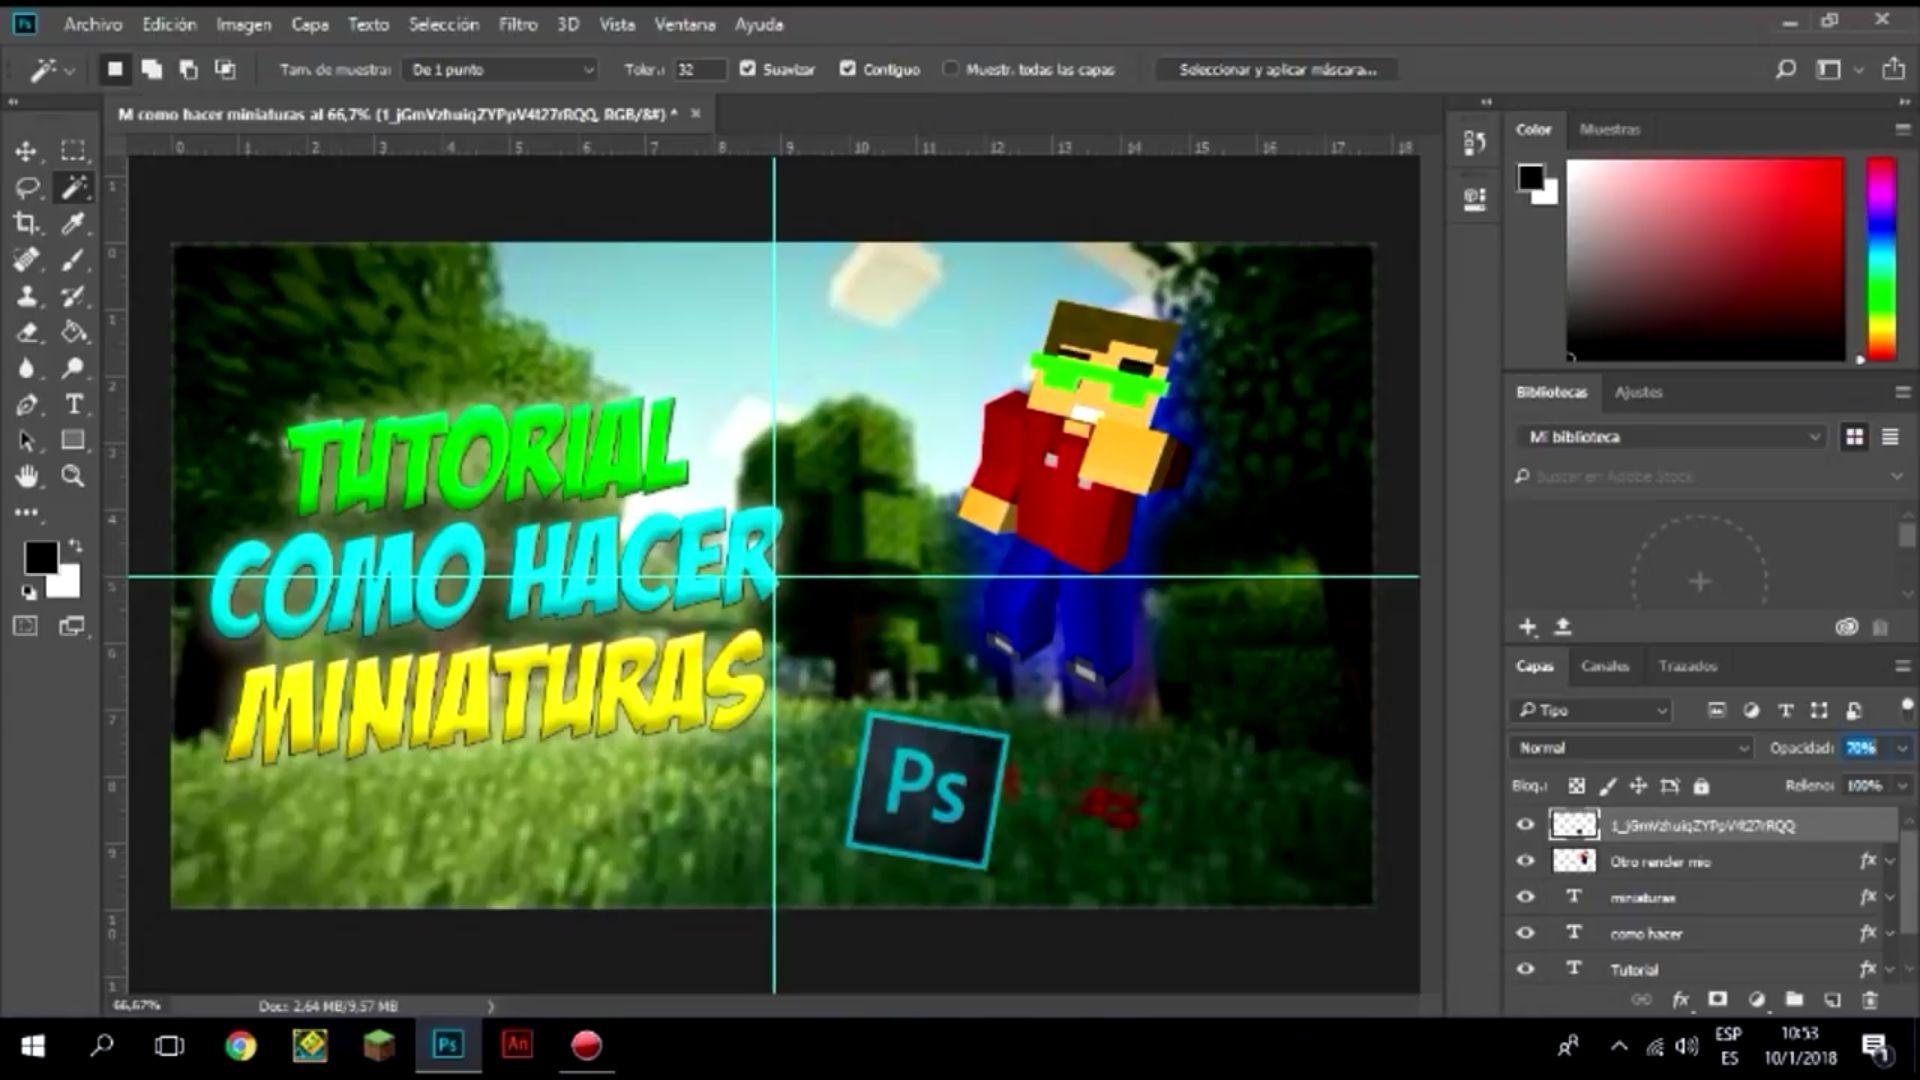 Tutorial Para Elaborar Miniaturas Con Adobe Photoshop